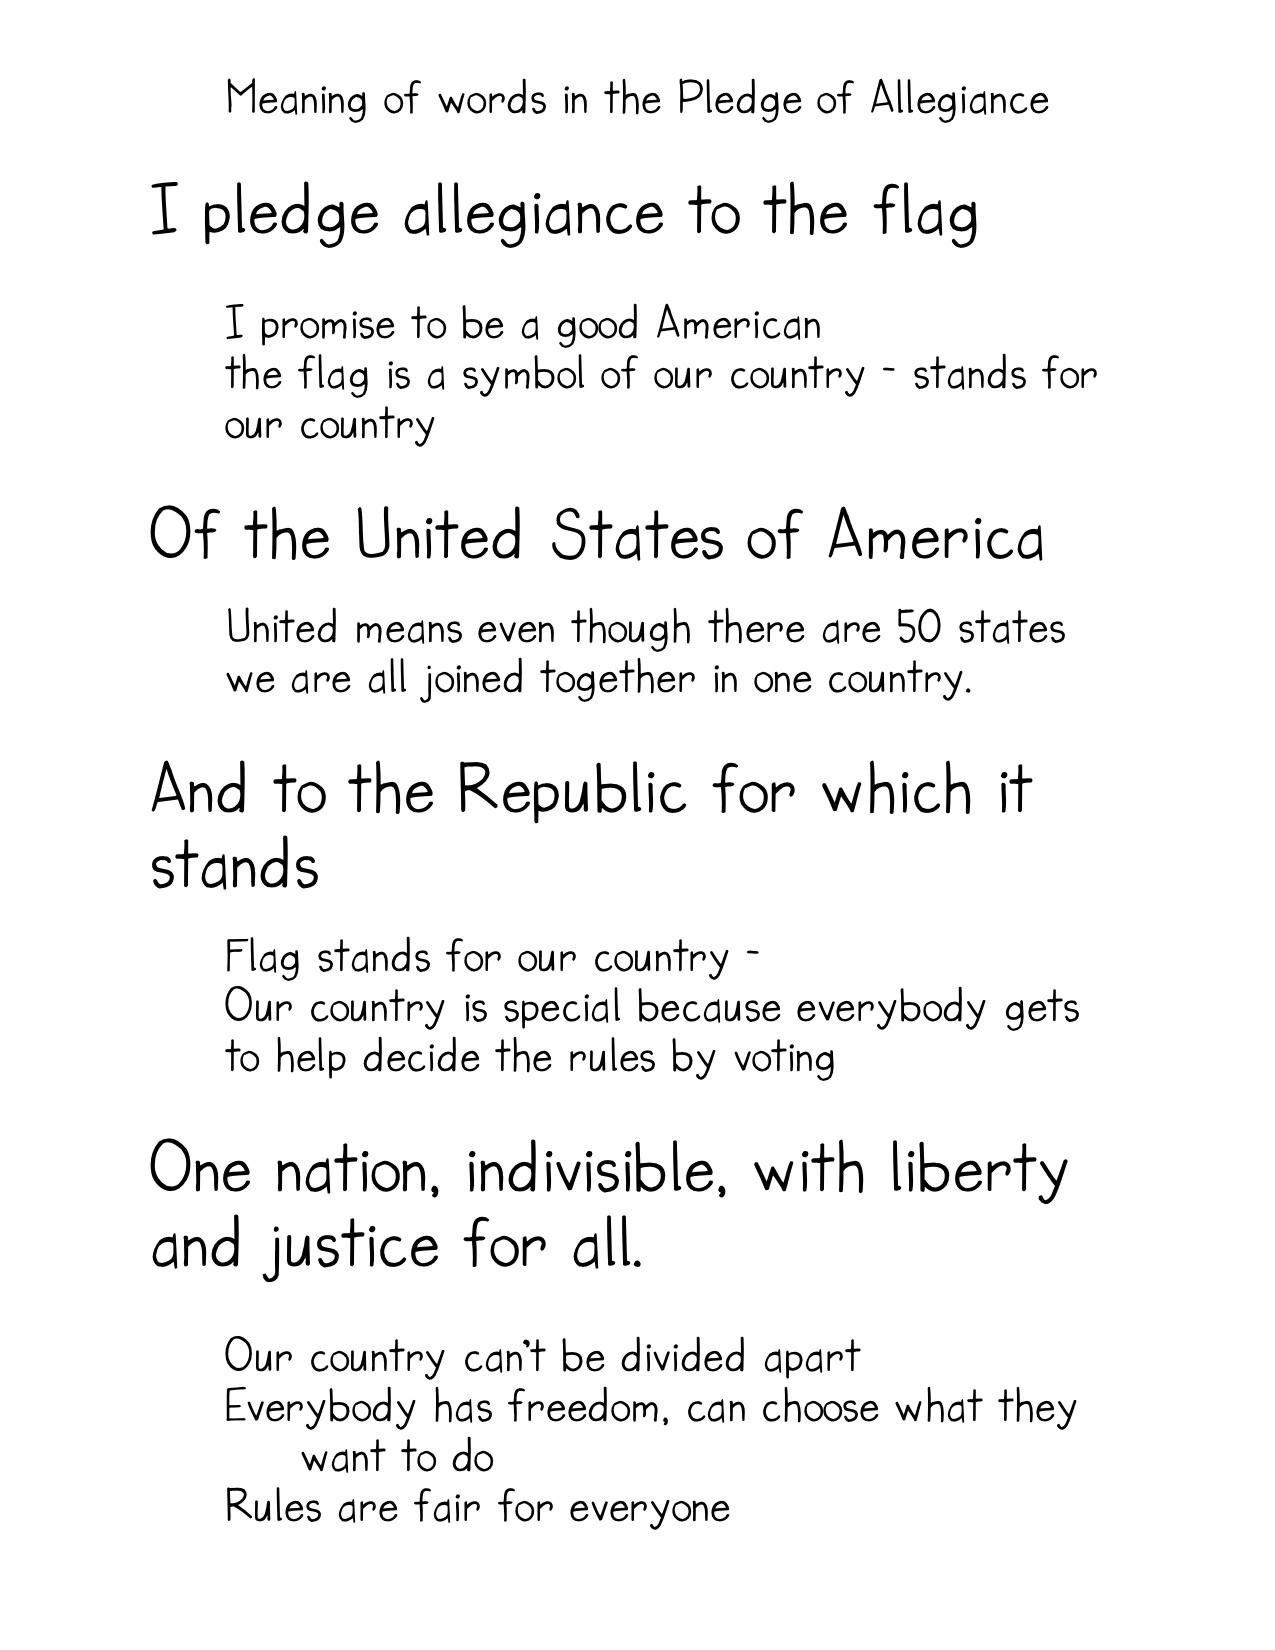 Pledge Of Allegiance Vocabulary And Symbols